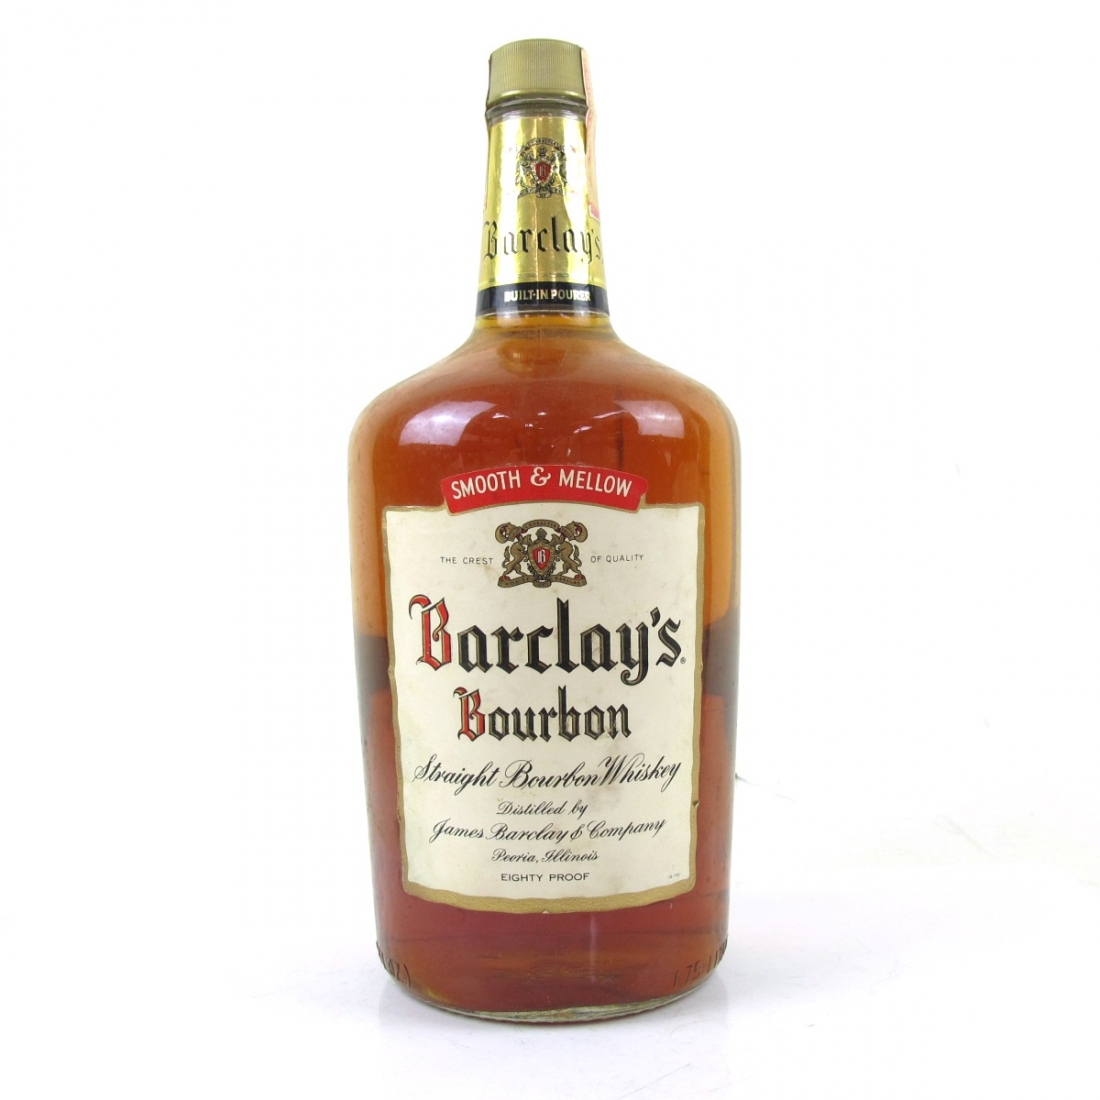 Barclay's Bourbon 1.75 Litres